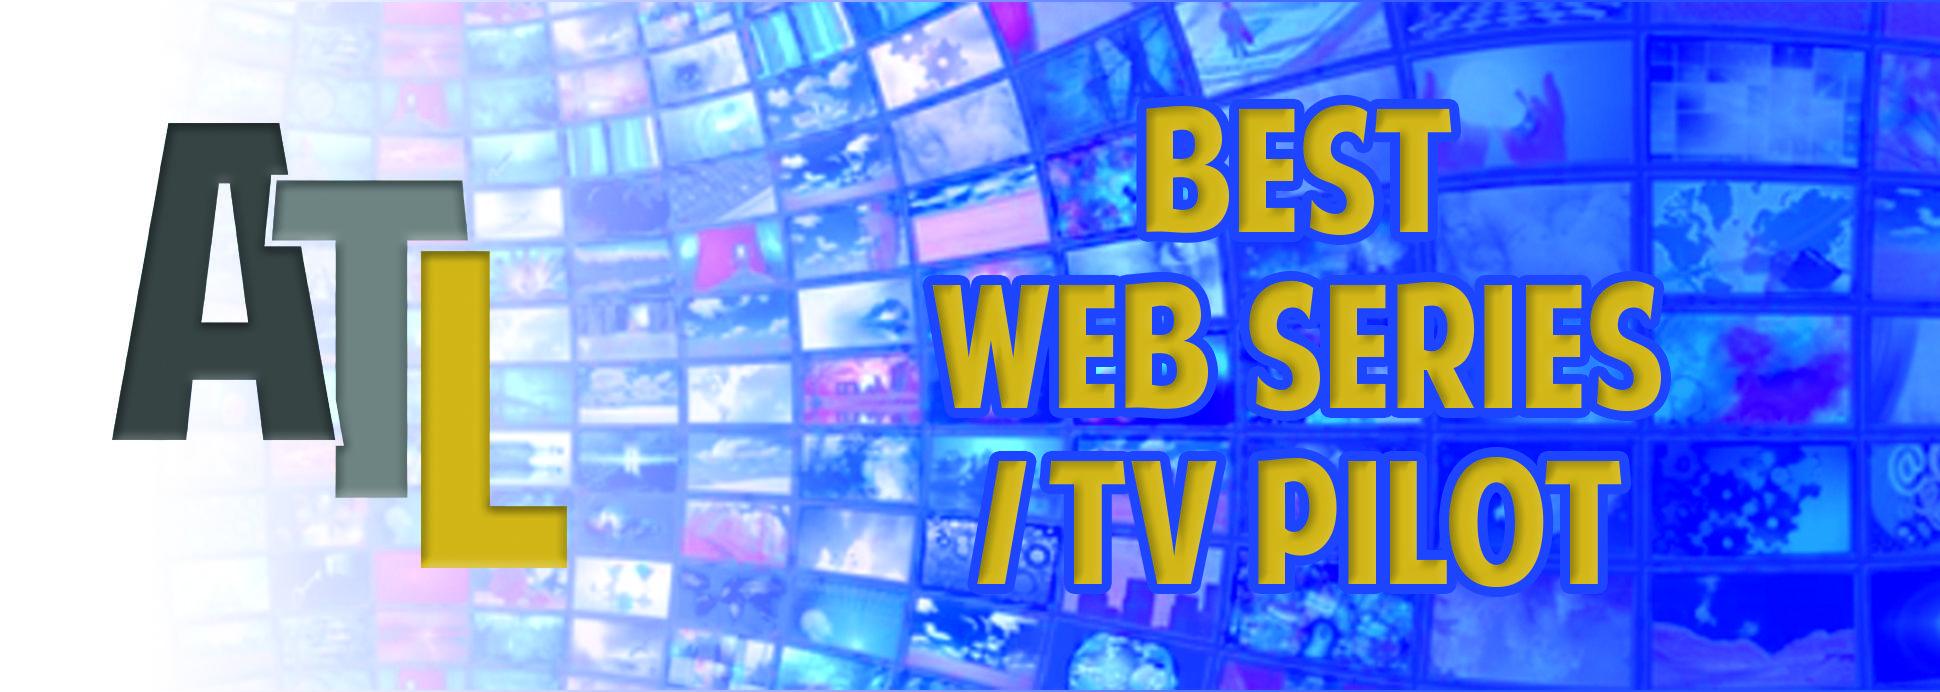 Best Web Series/TV Pilot